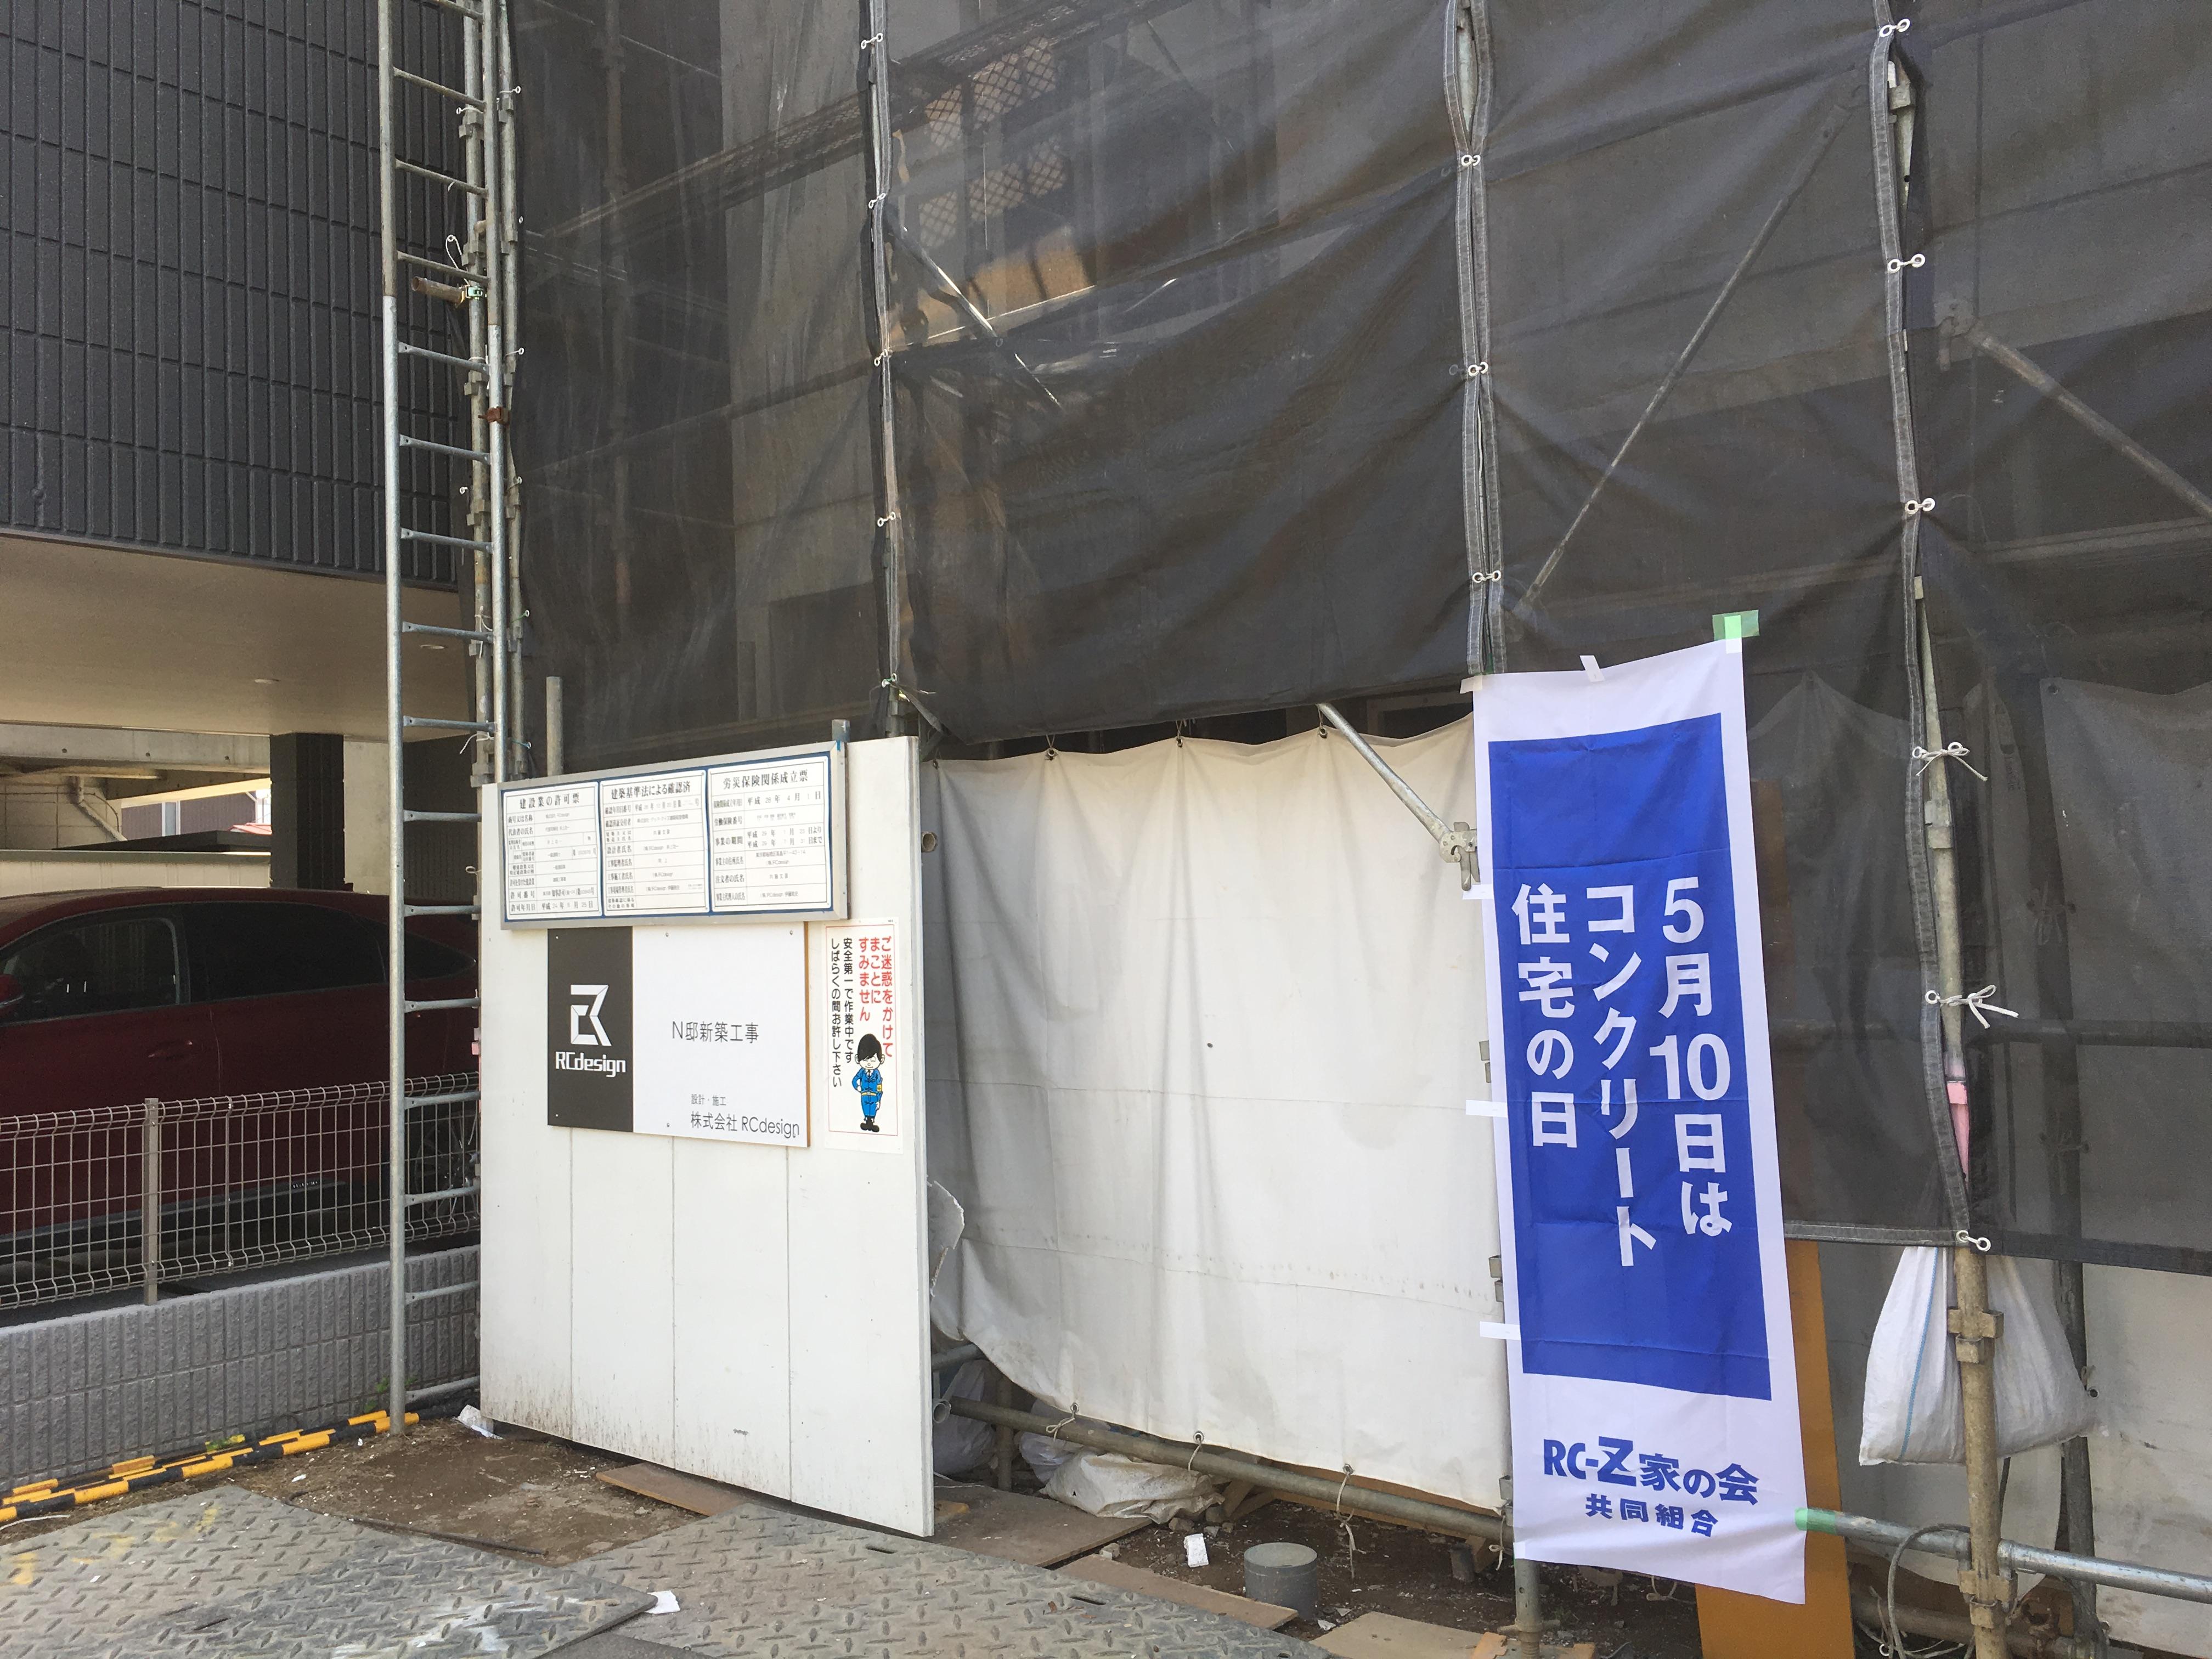 http://www.rc-zienokai.net/news/blogimages/IMG_7875.JPG